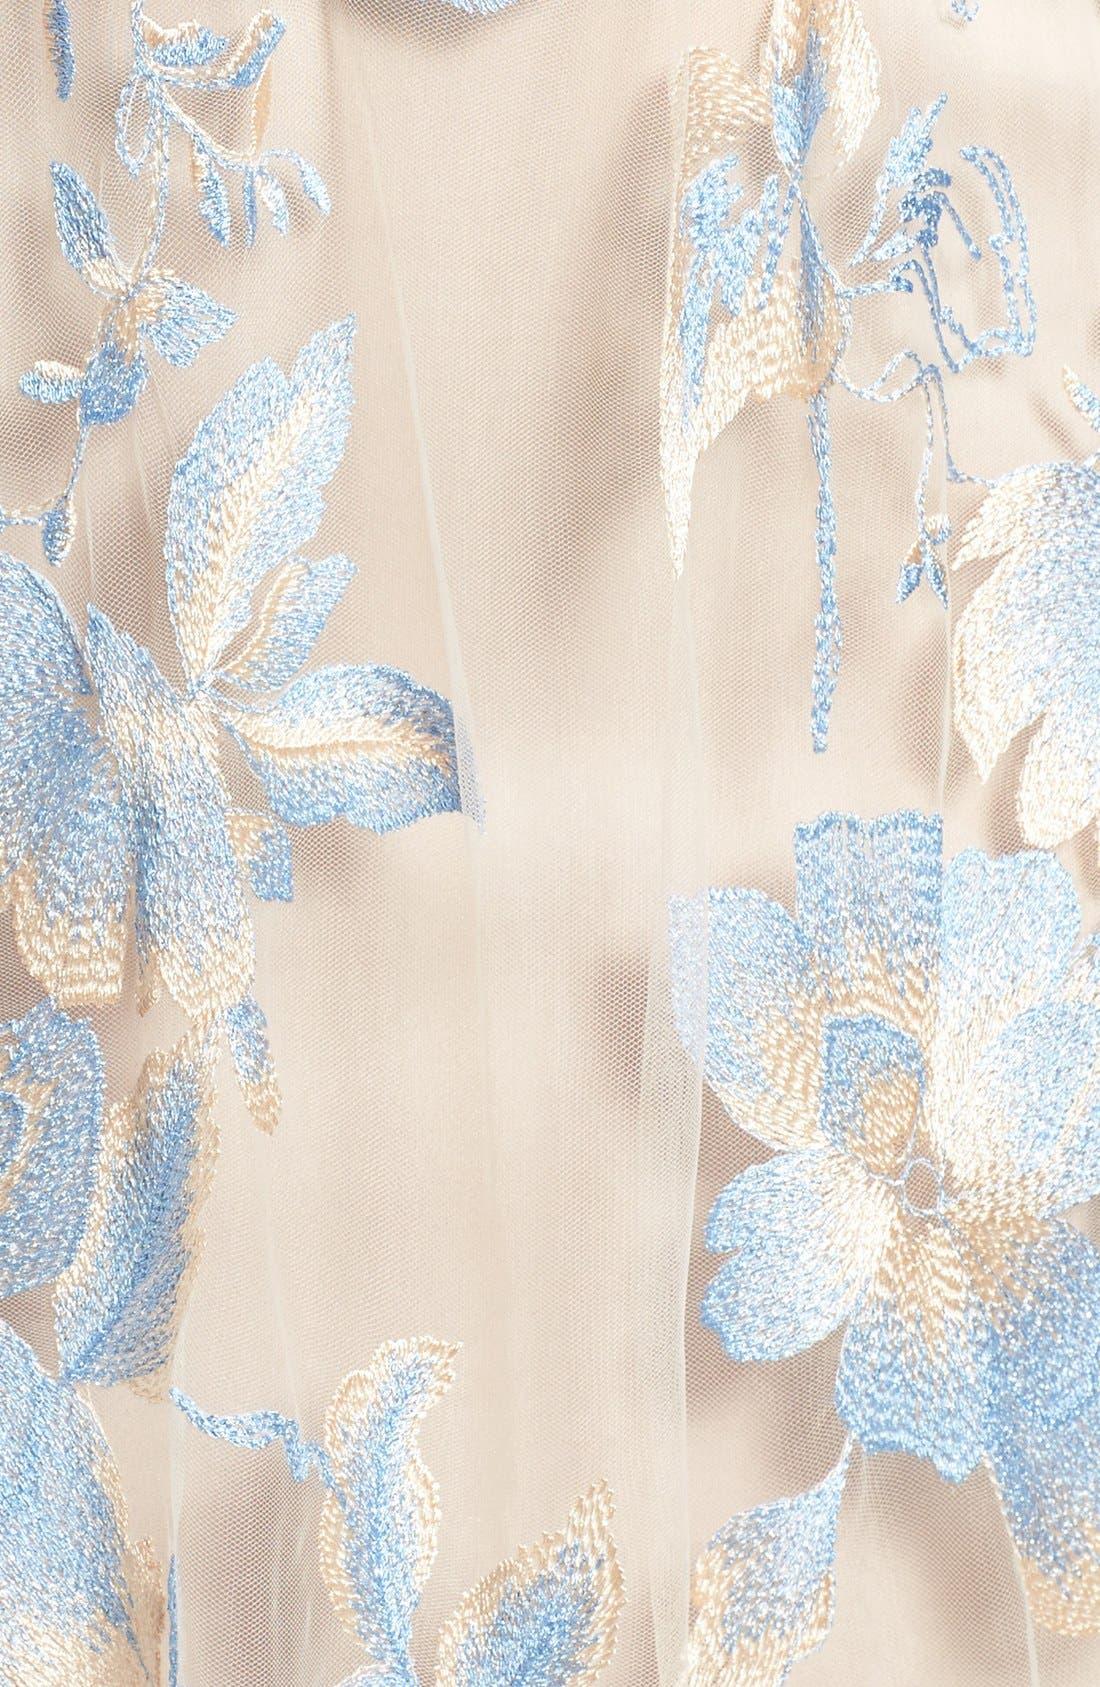 Illusion Lace Gown,                             Alternate thumbnail 9, color,                             298